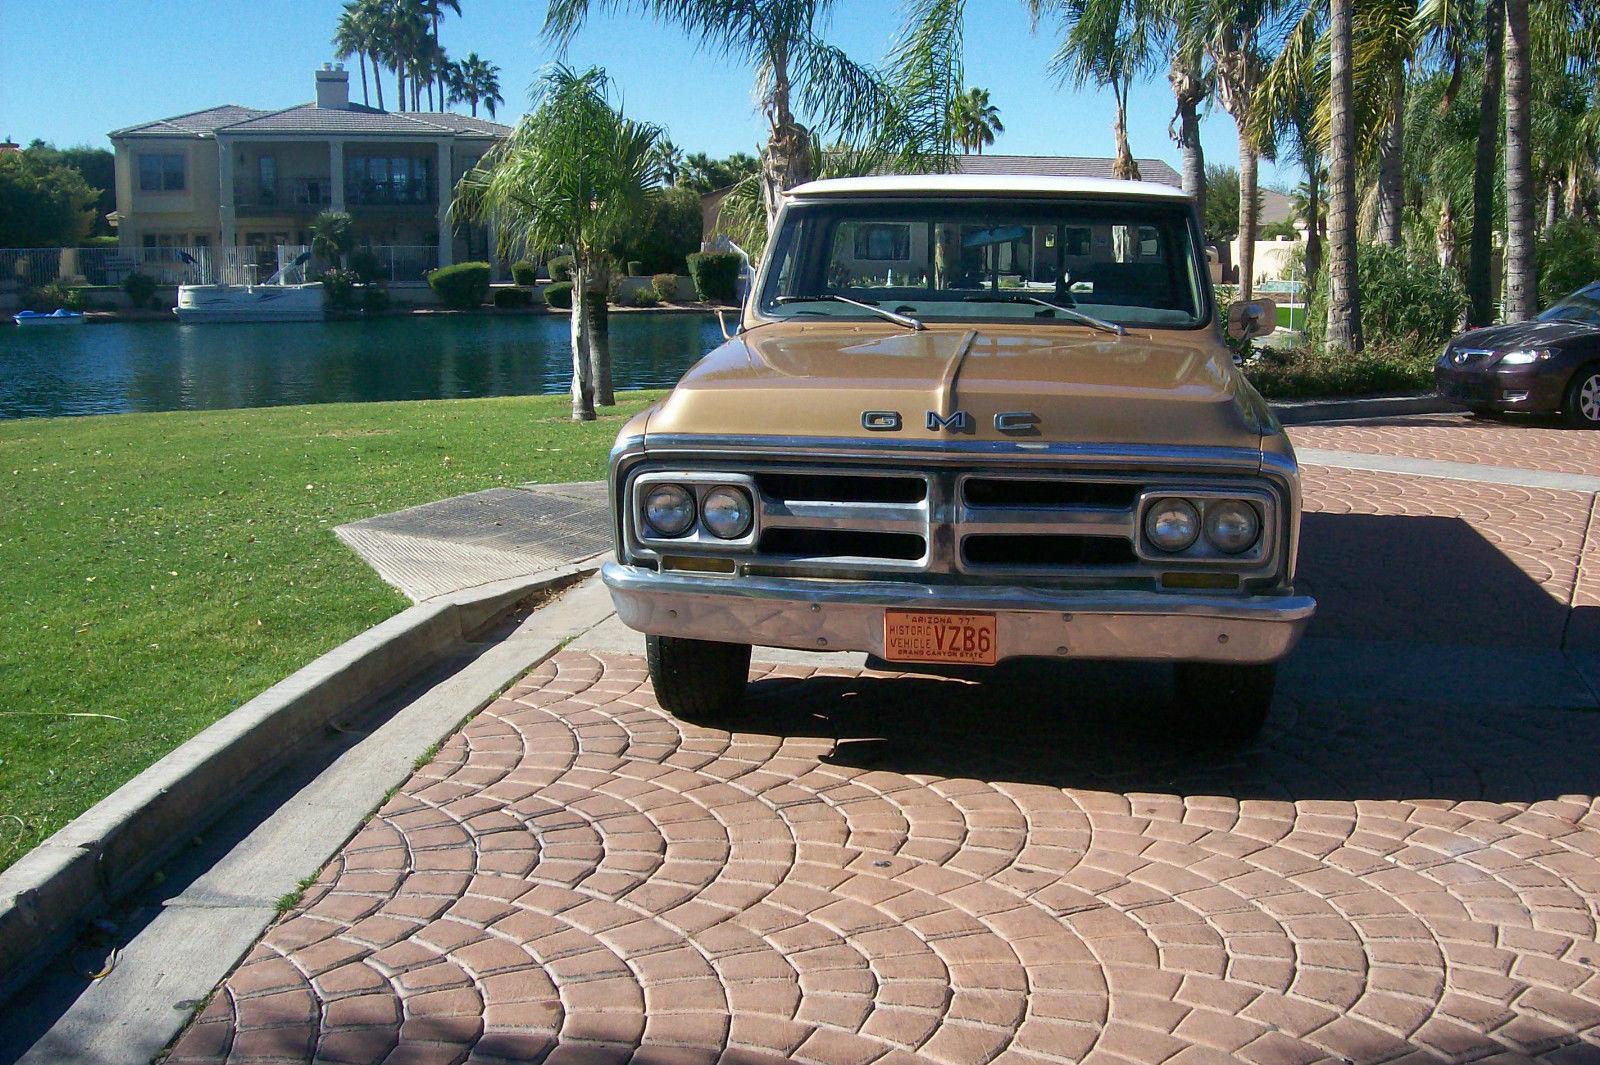 1969 Gmc Truck 1969 Gmc Custom Cab Truck Classic Gmc Sierra 1500 1969 For Sale